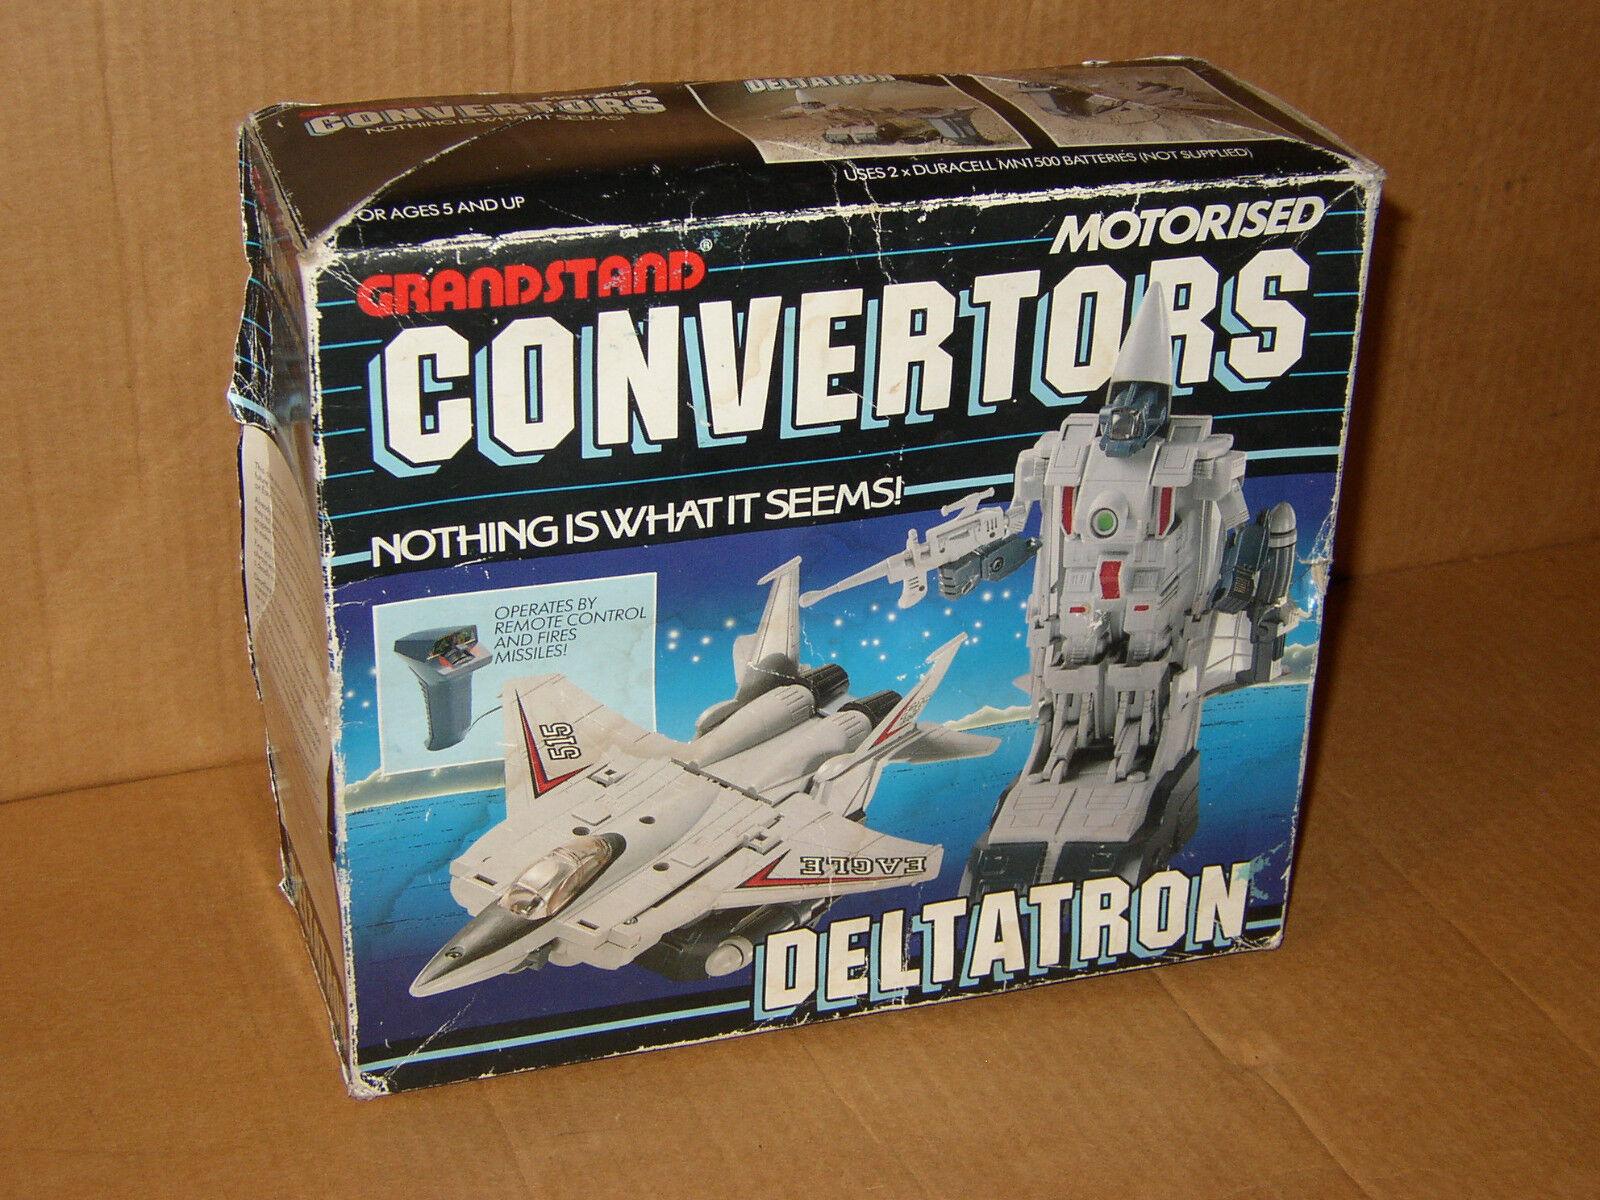 DELTATRON Boxed 100% Vintage Grandstand Congreenors Transformers